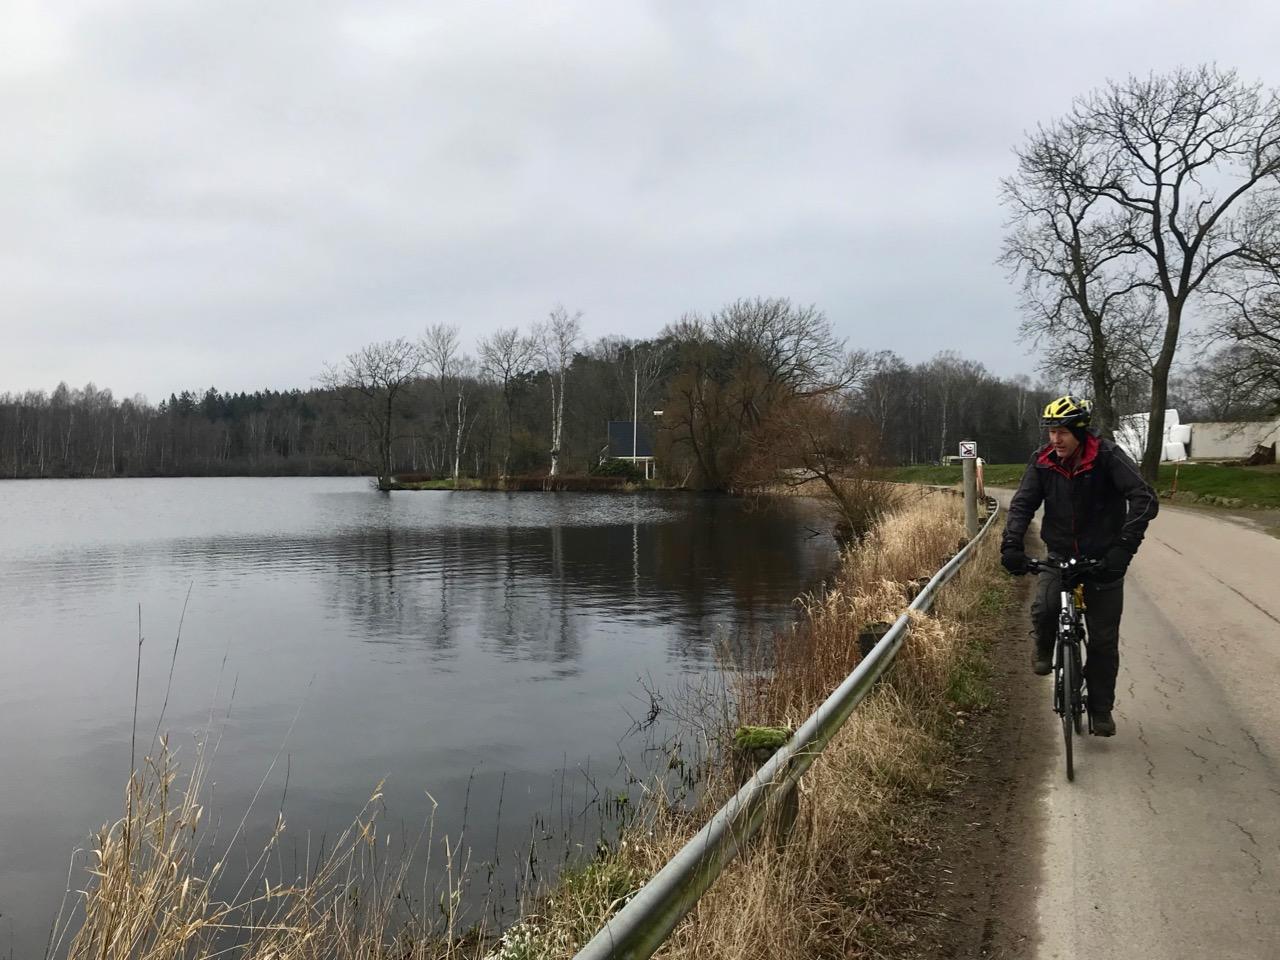 Munka-Ljungby